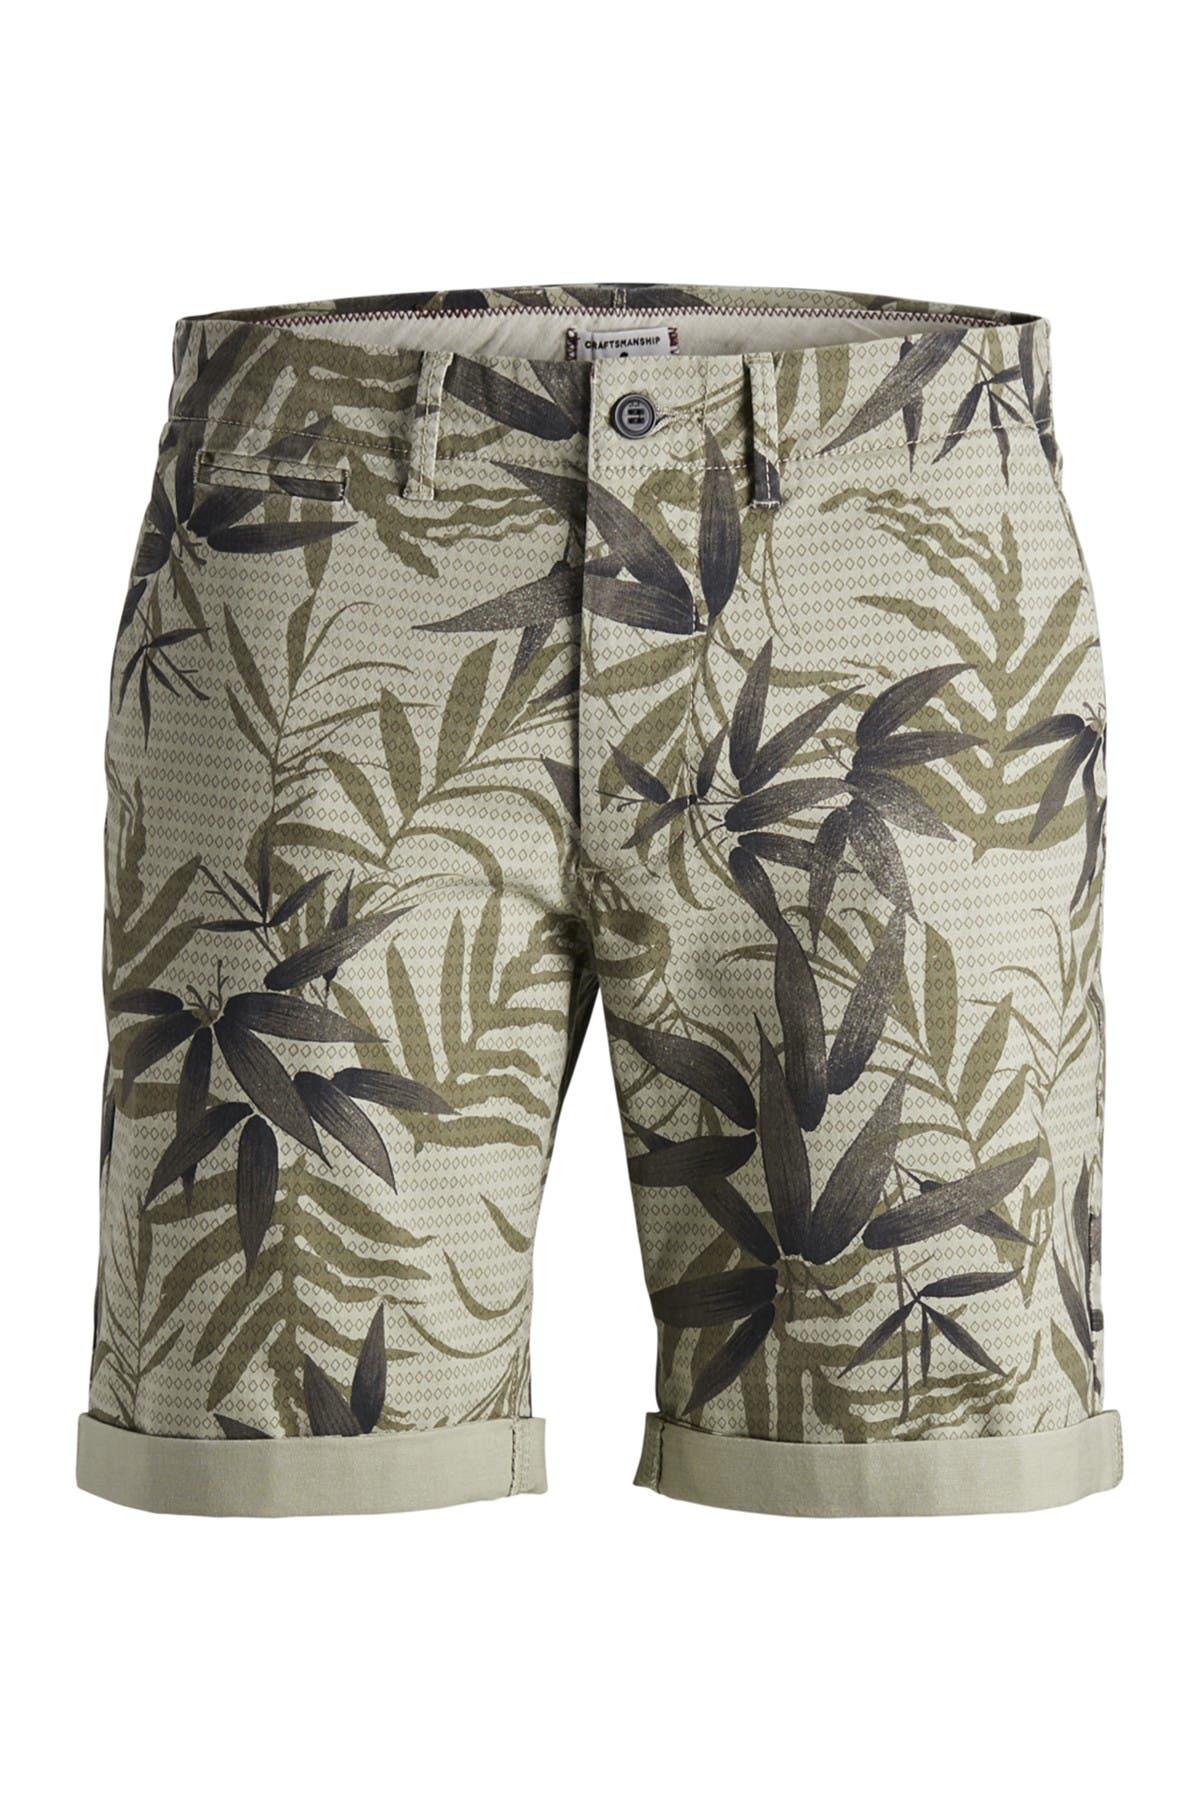 Image of JACK & JONES Enzo Printed Chino Shorts